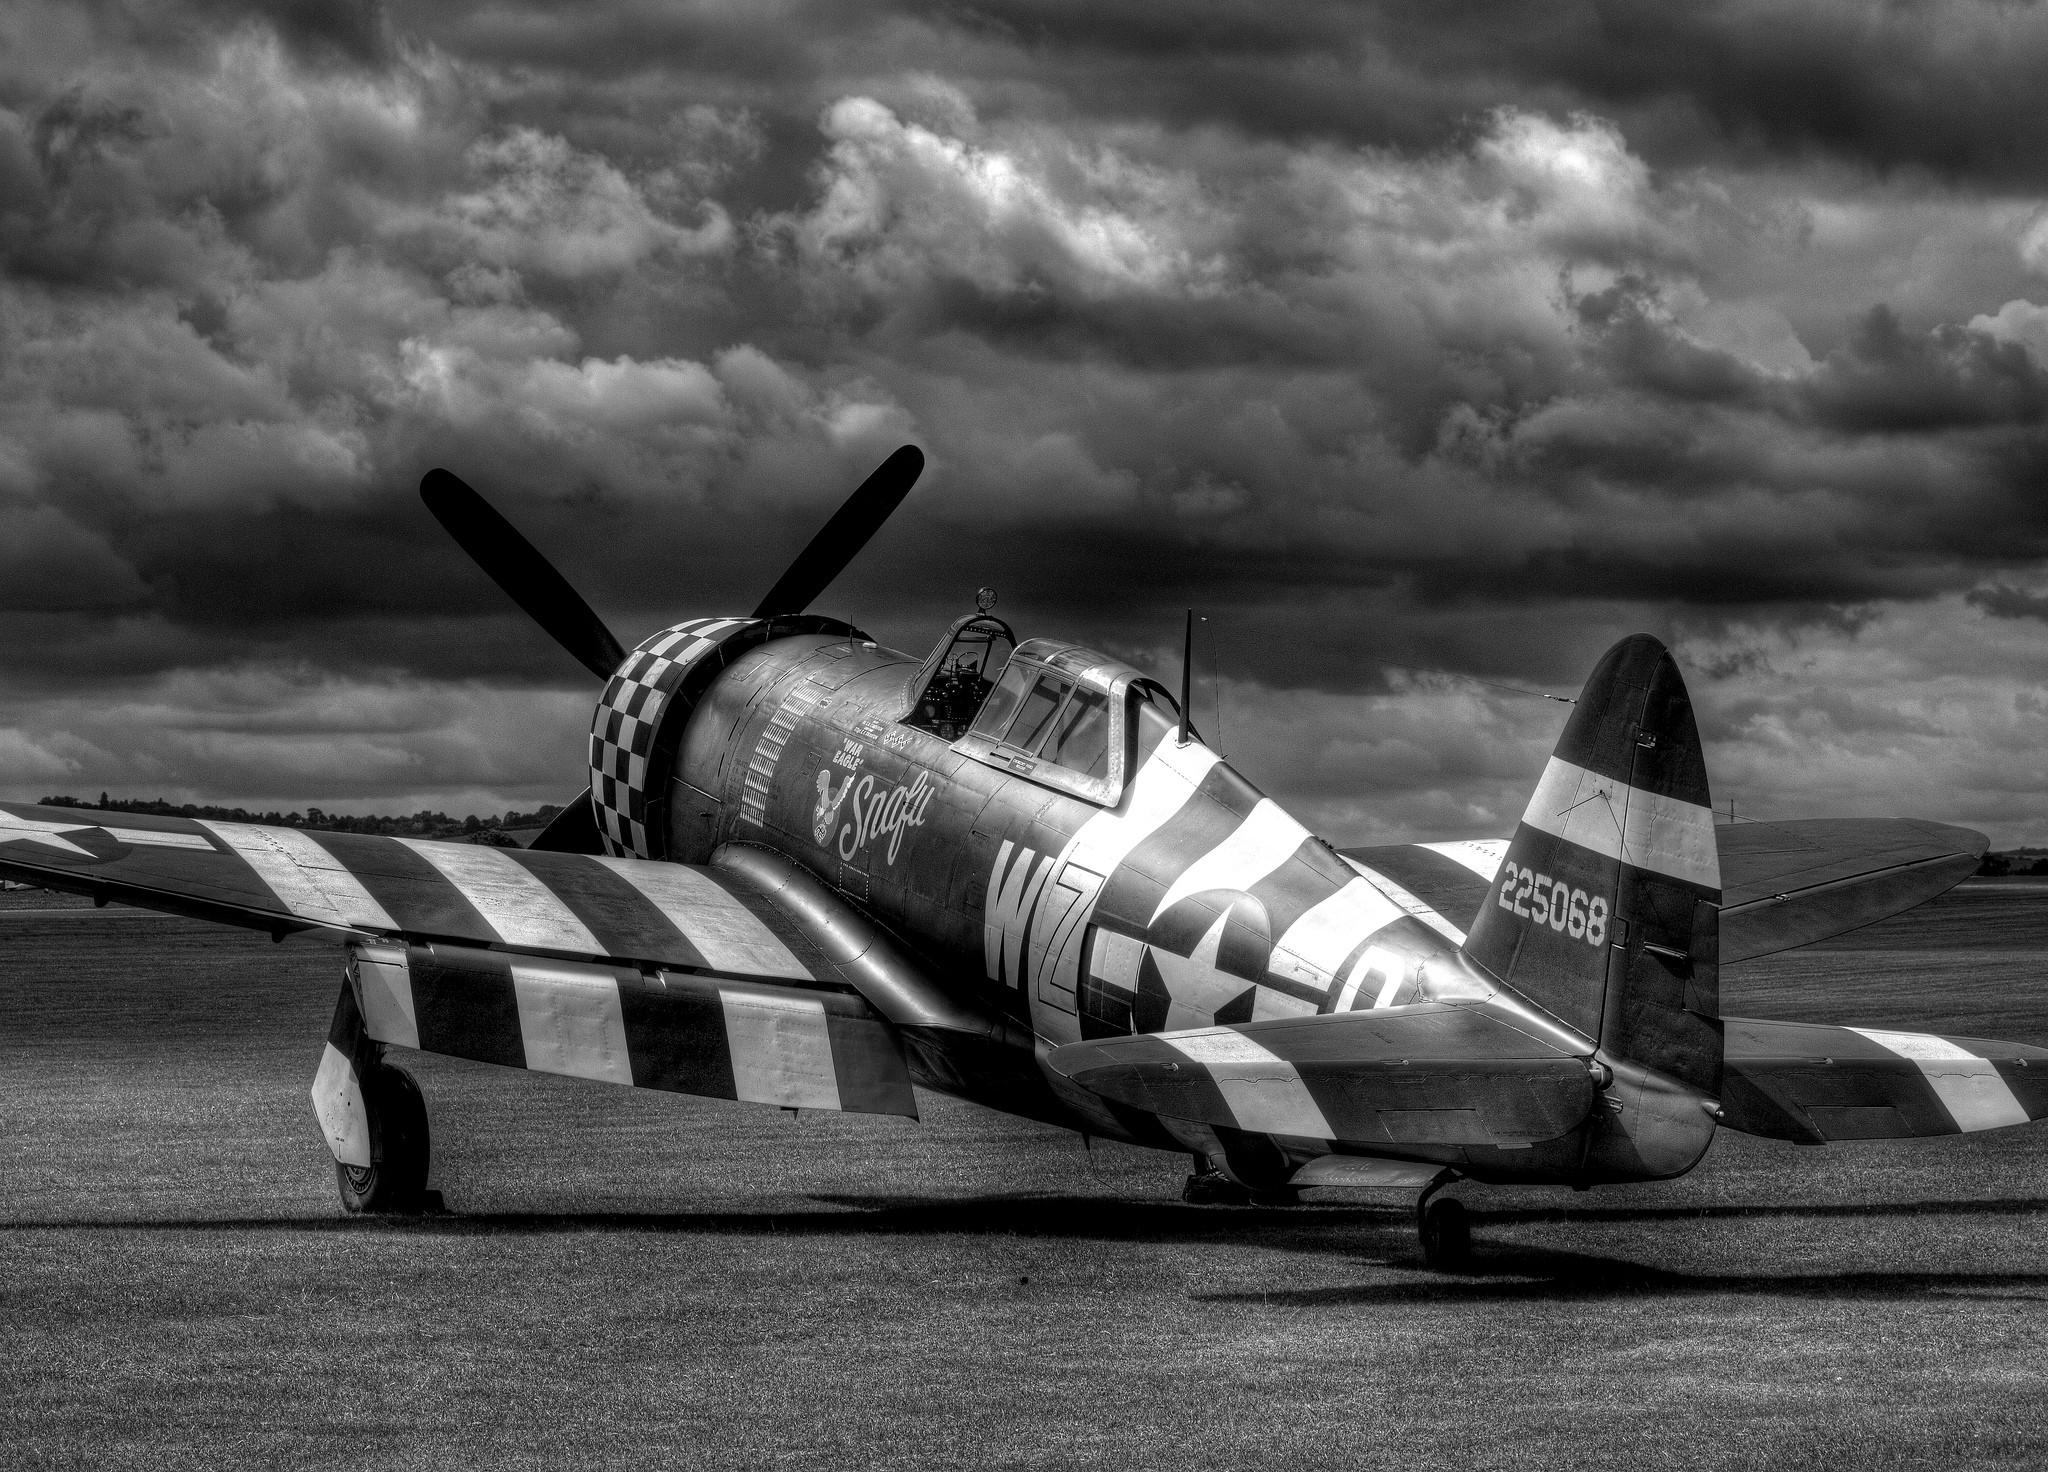 monochrome Aircraft Military Republic P 47 Thunderbolt 2048x1472